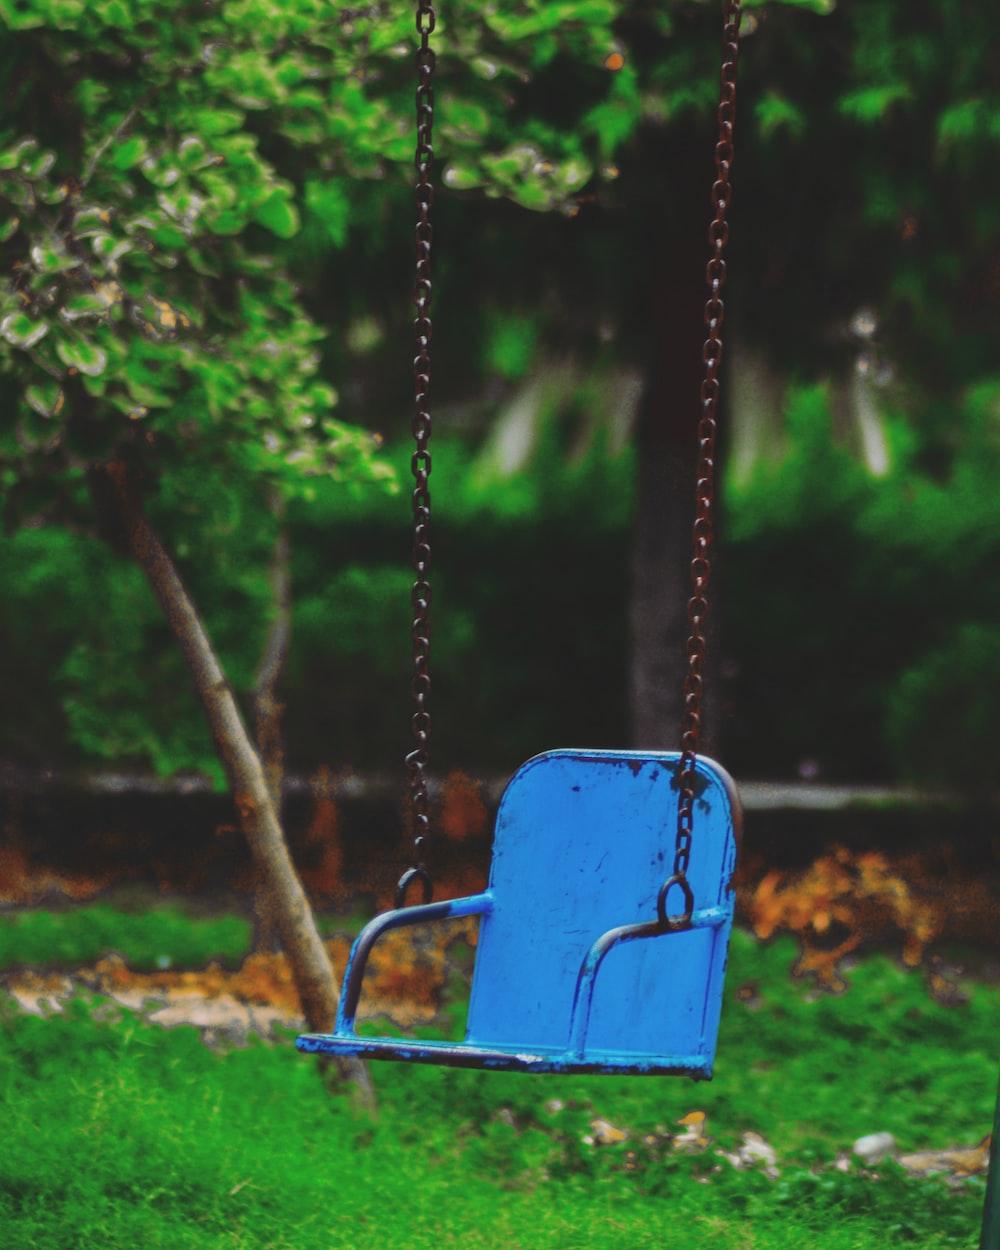 blue metal swing